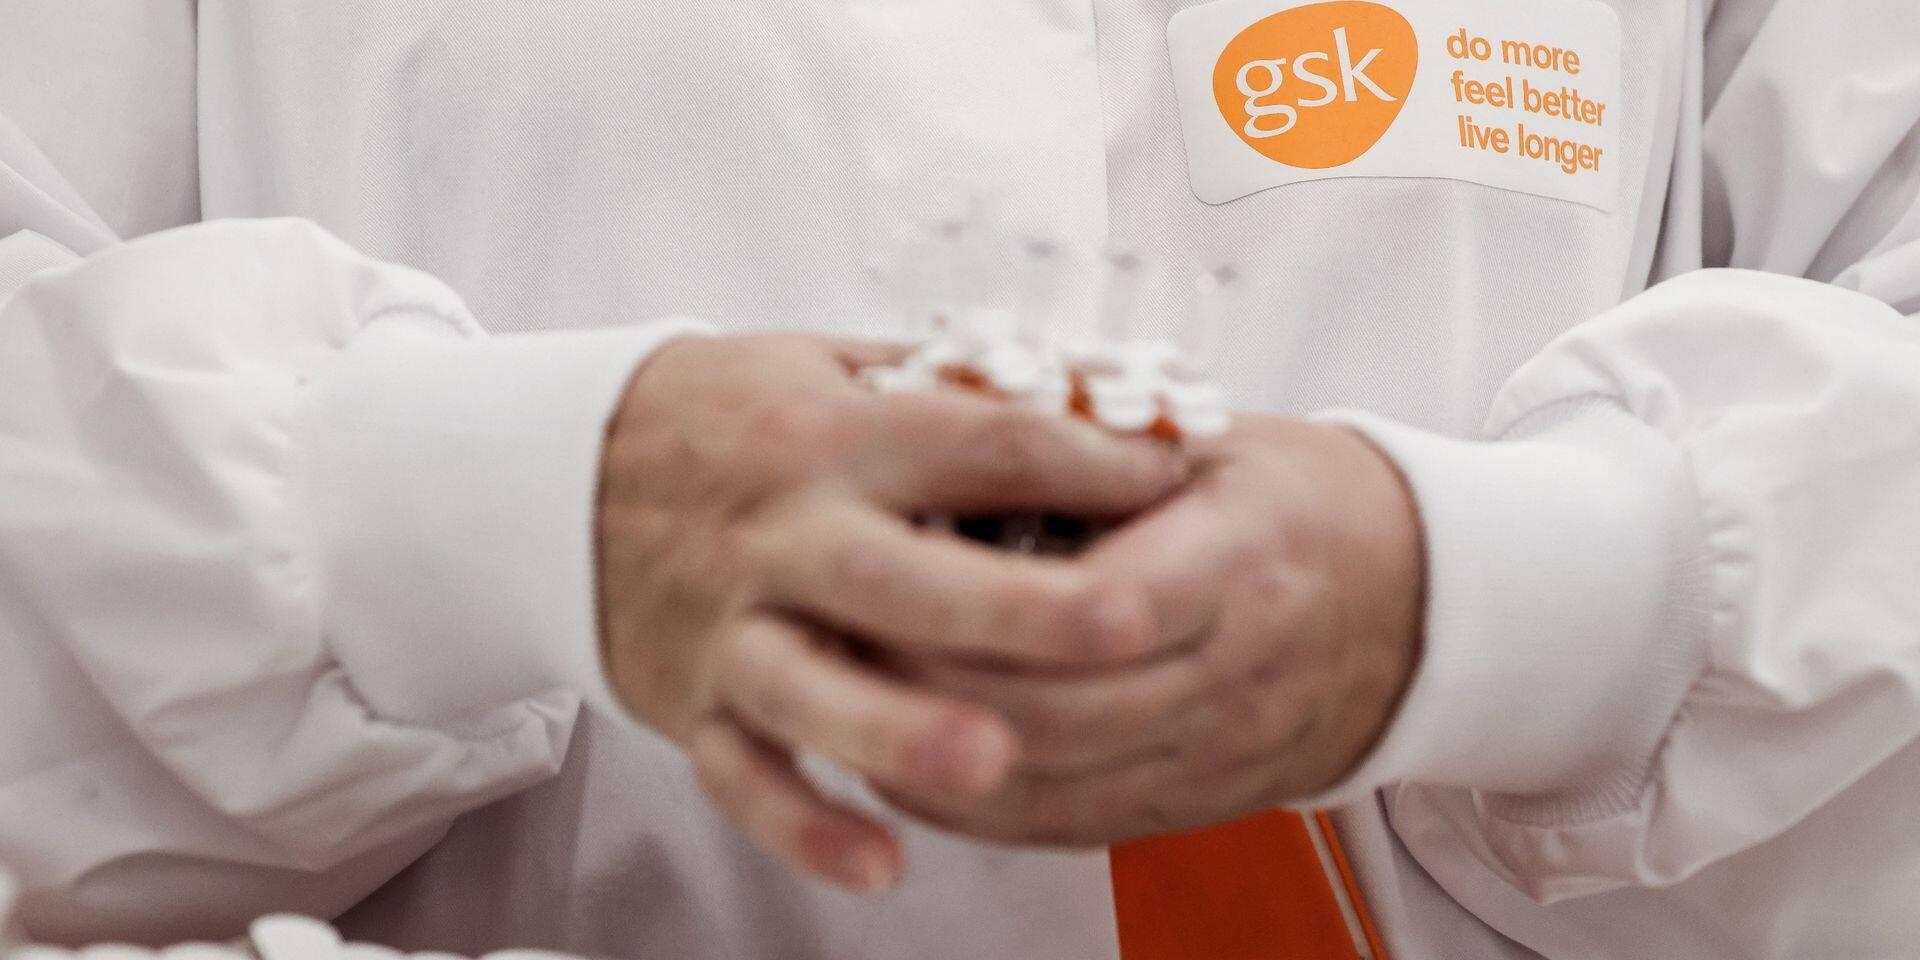 Vaccin anti-Covid GSK-Medicago: résultats positifs intermédiaires de phase 2